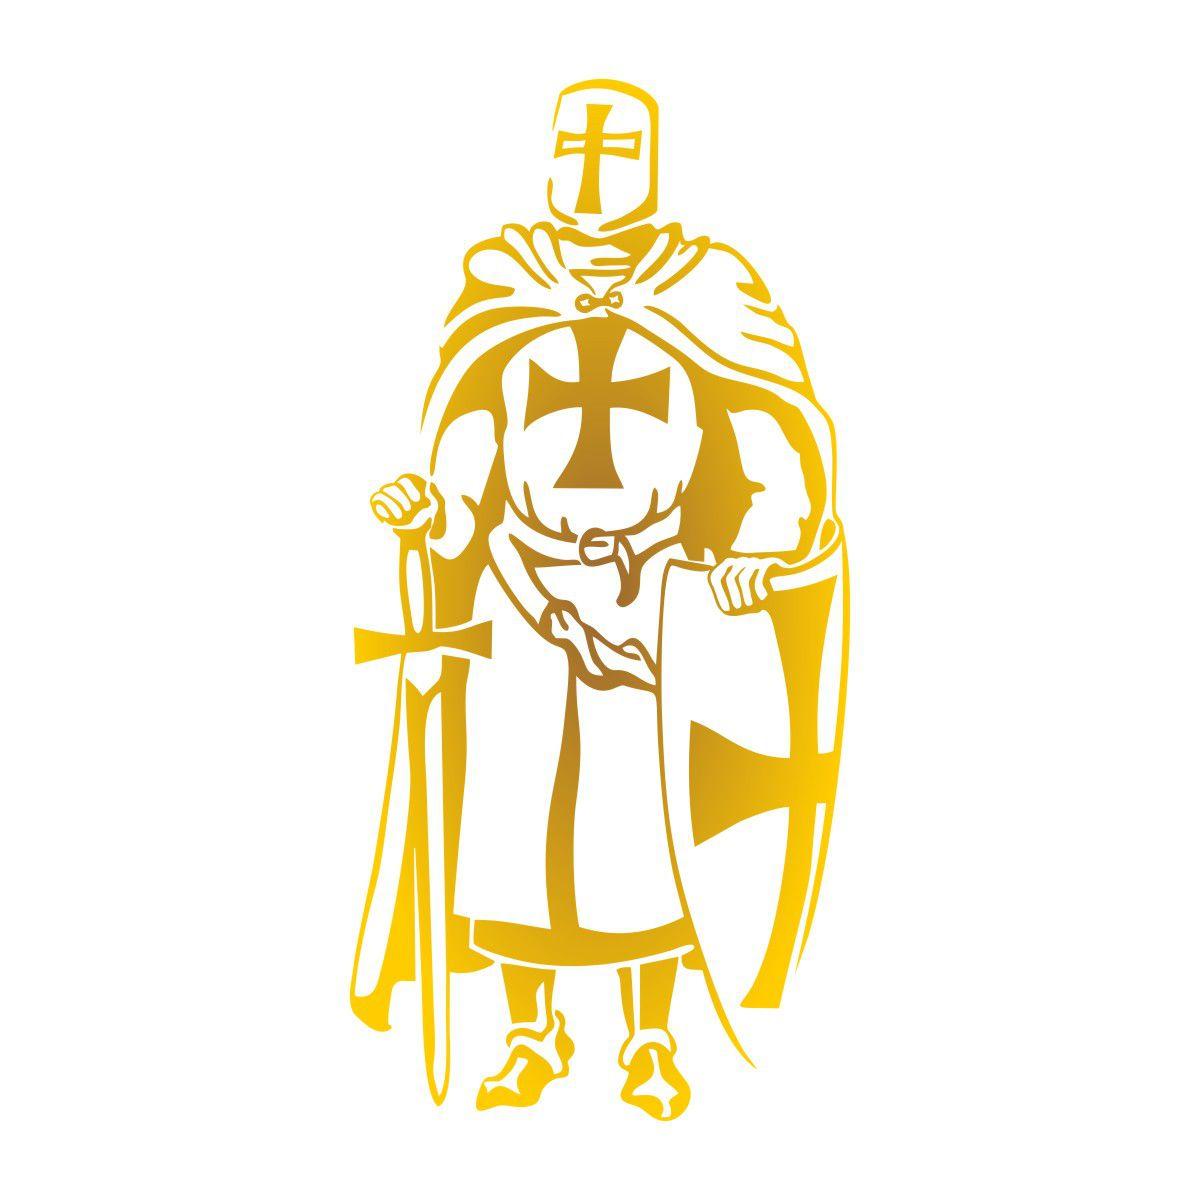 Adesivo Cavaleiro Templário